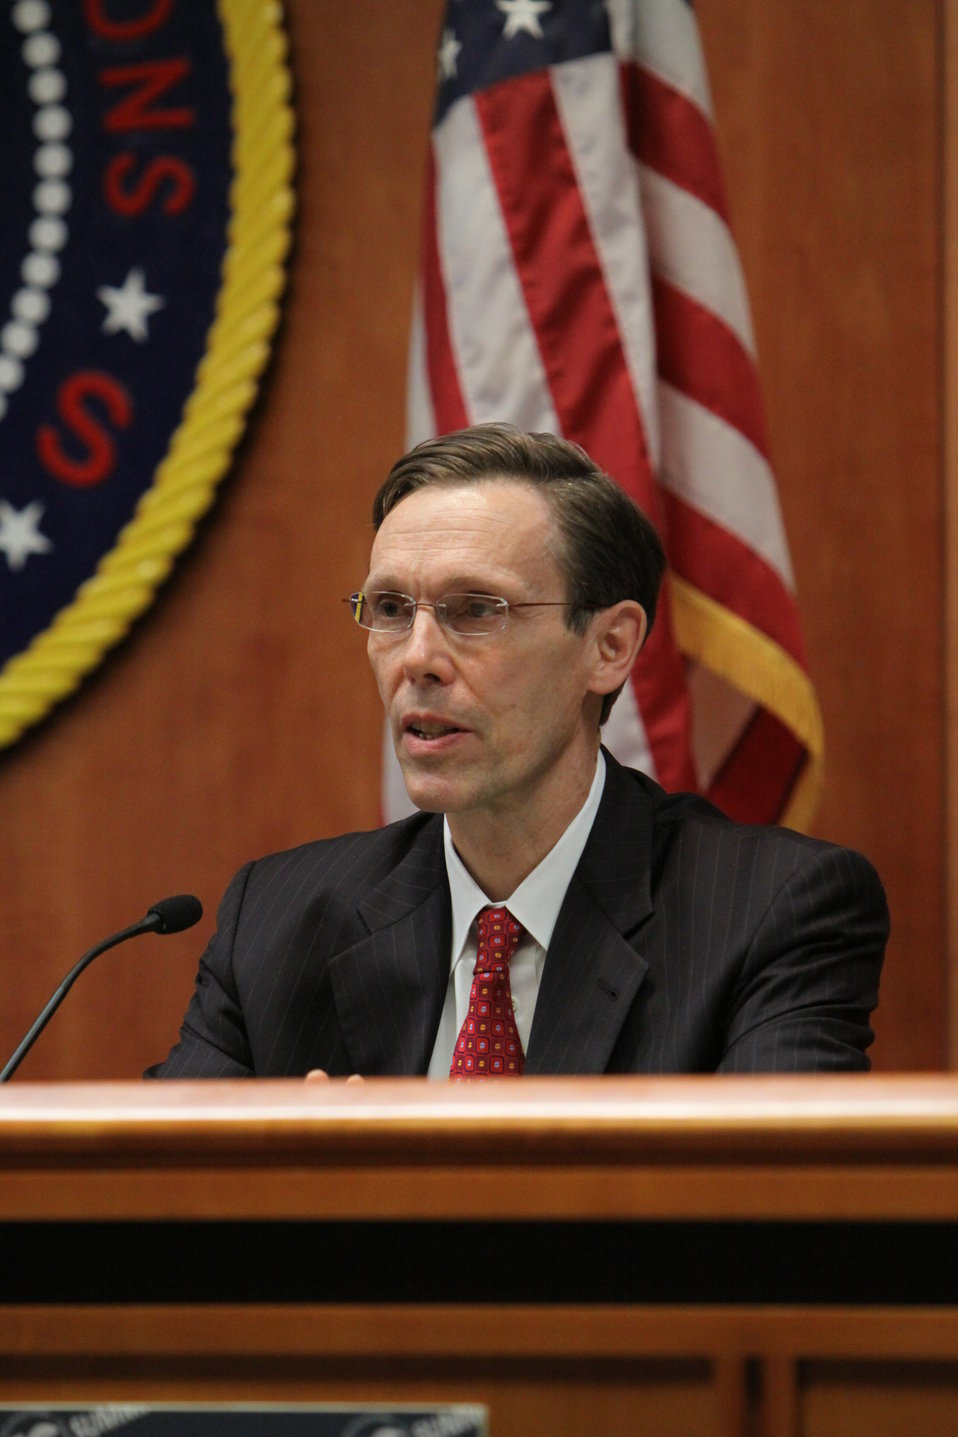 Peter Pitsch, Intel